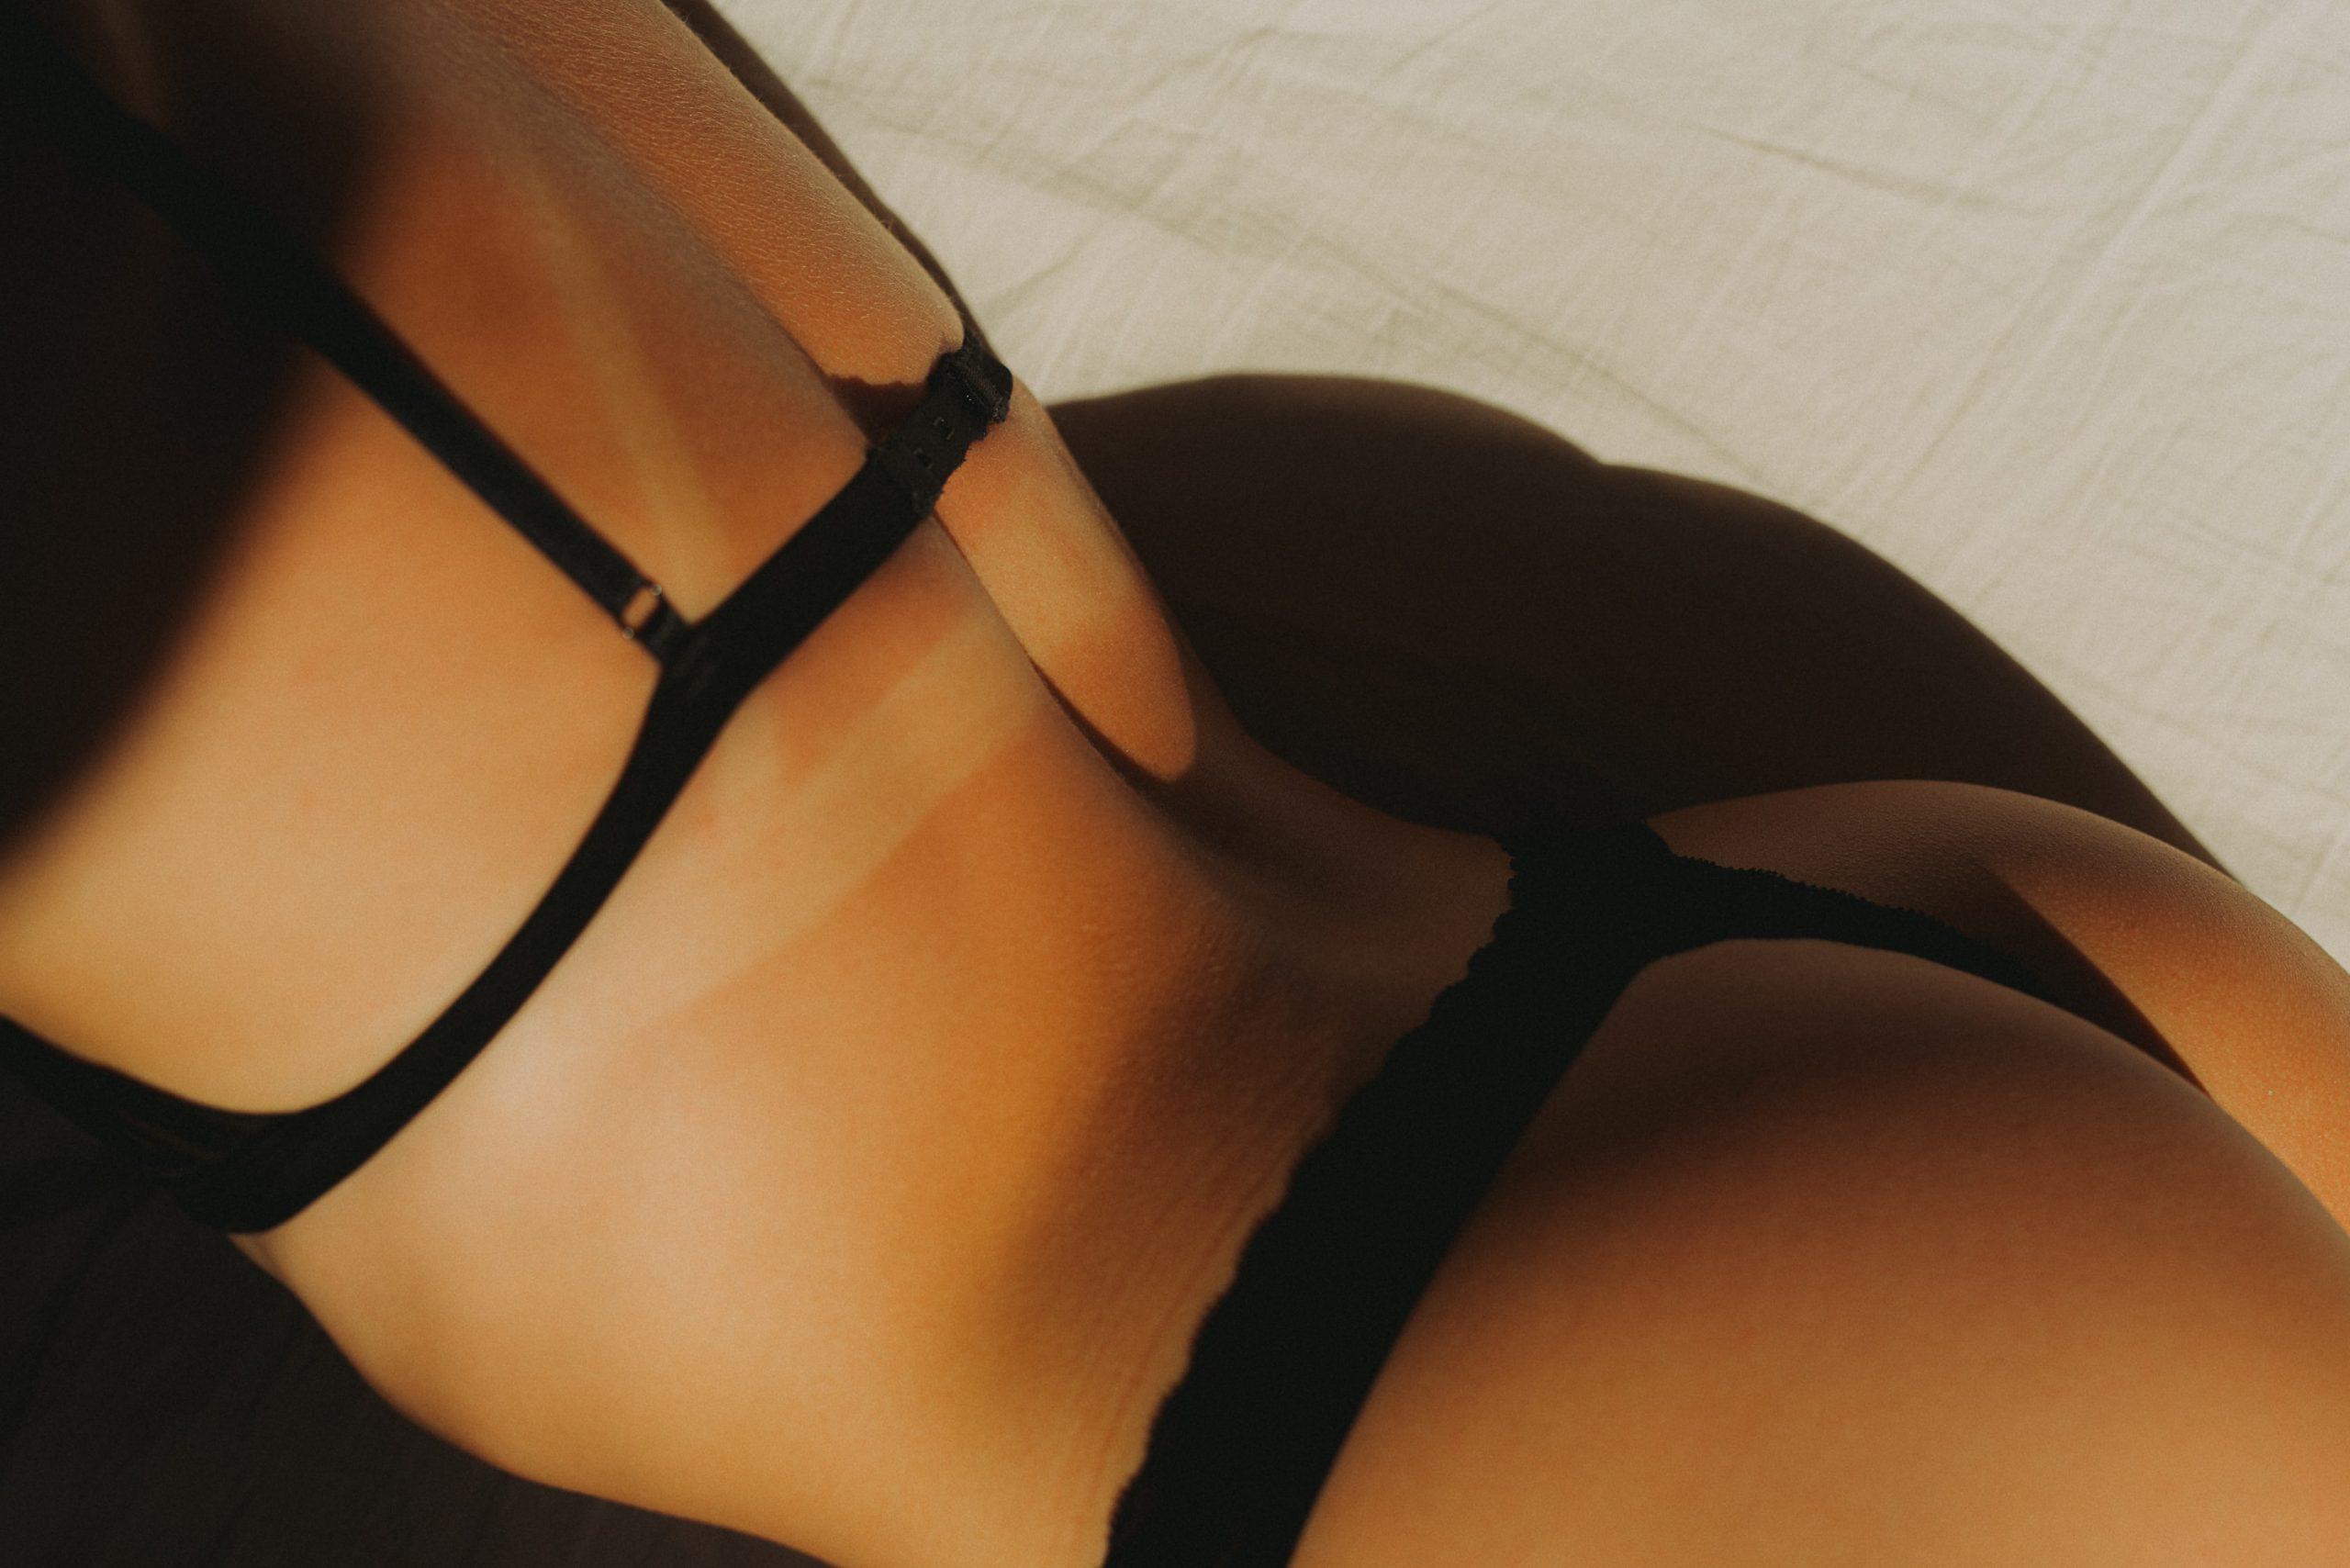 bæredygtigt undertøj